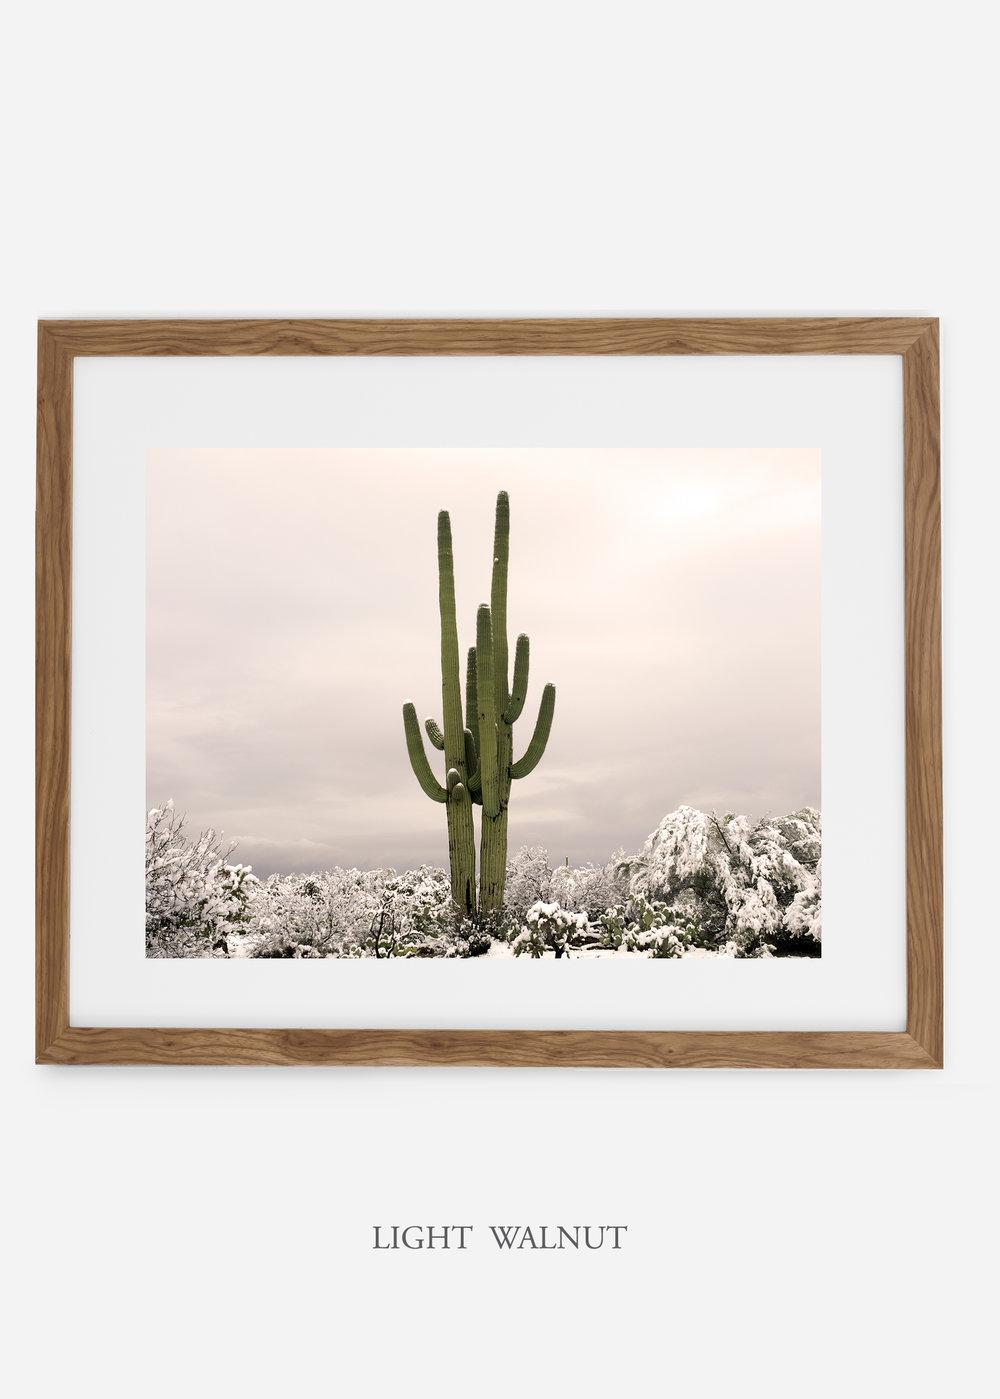 lightwalnutframe-saguaroNo.5-wildercalifornia-art-wallart-cactusprint-homedecor-prints-arizona-botanical-artwork-interiordesign.jpg